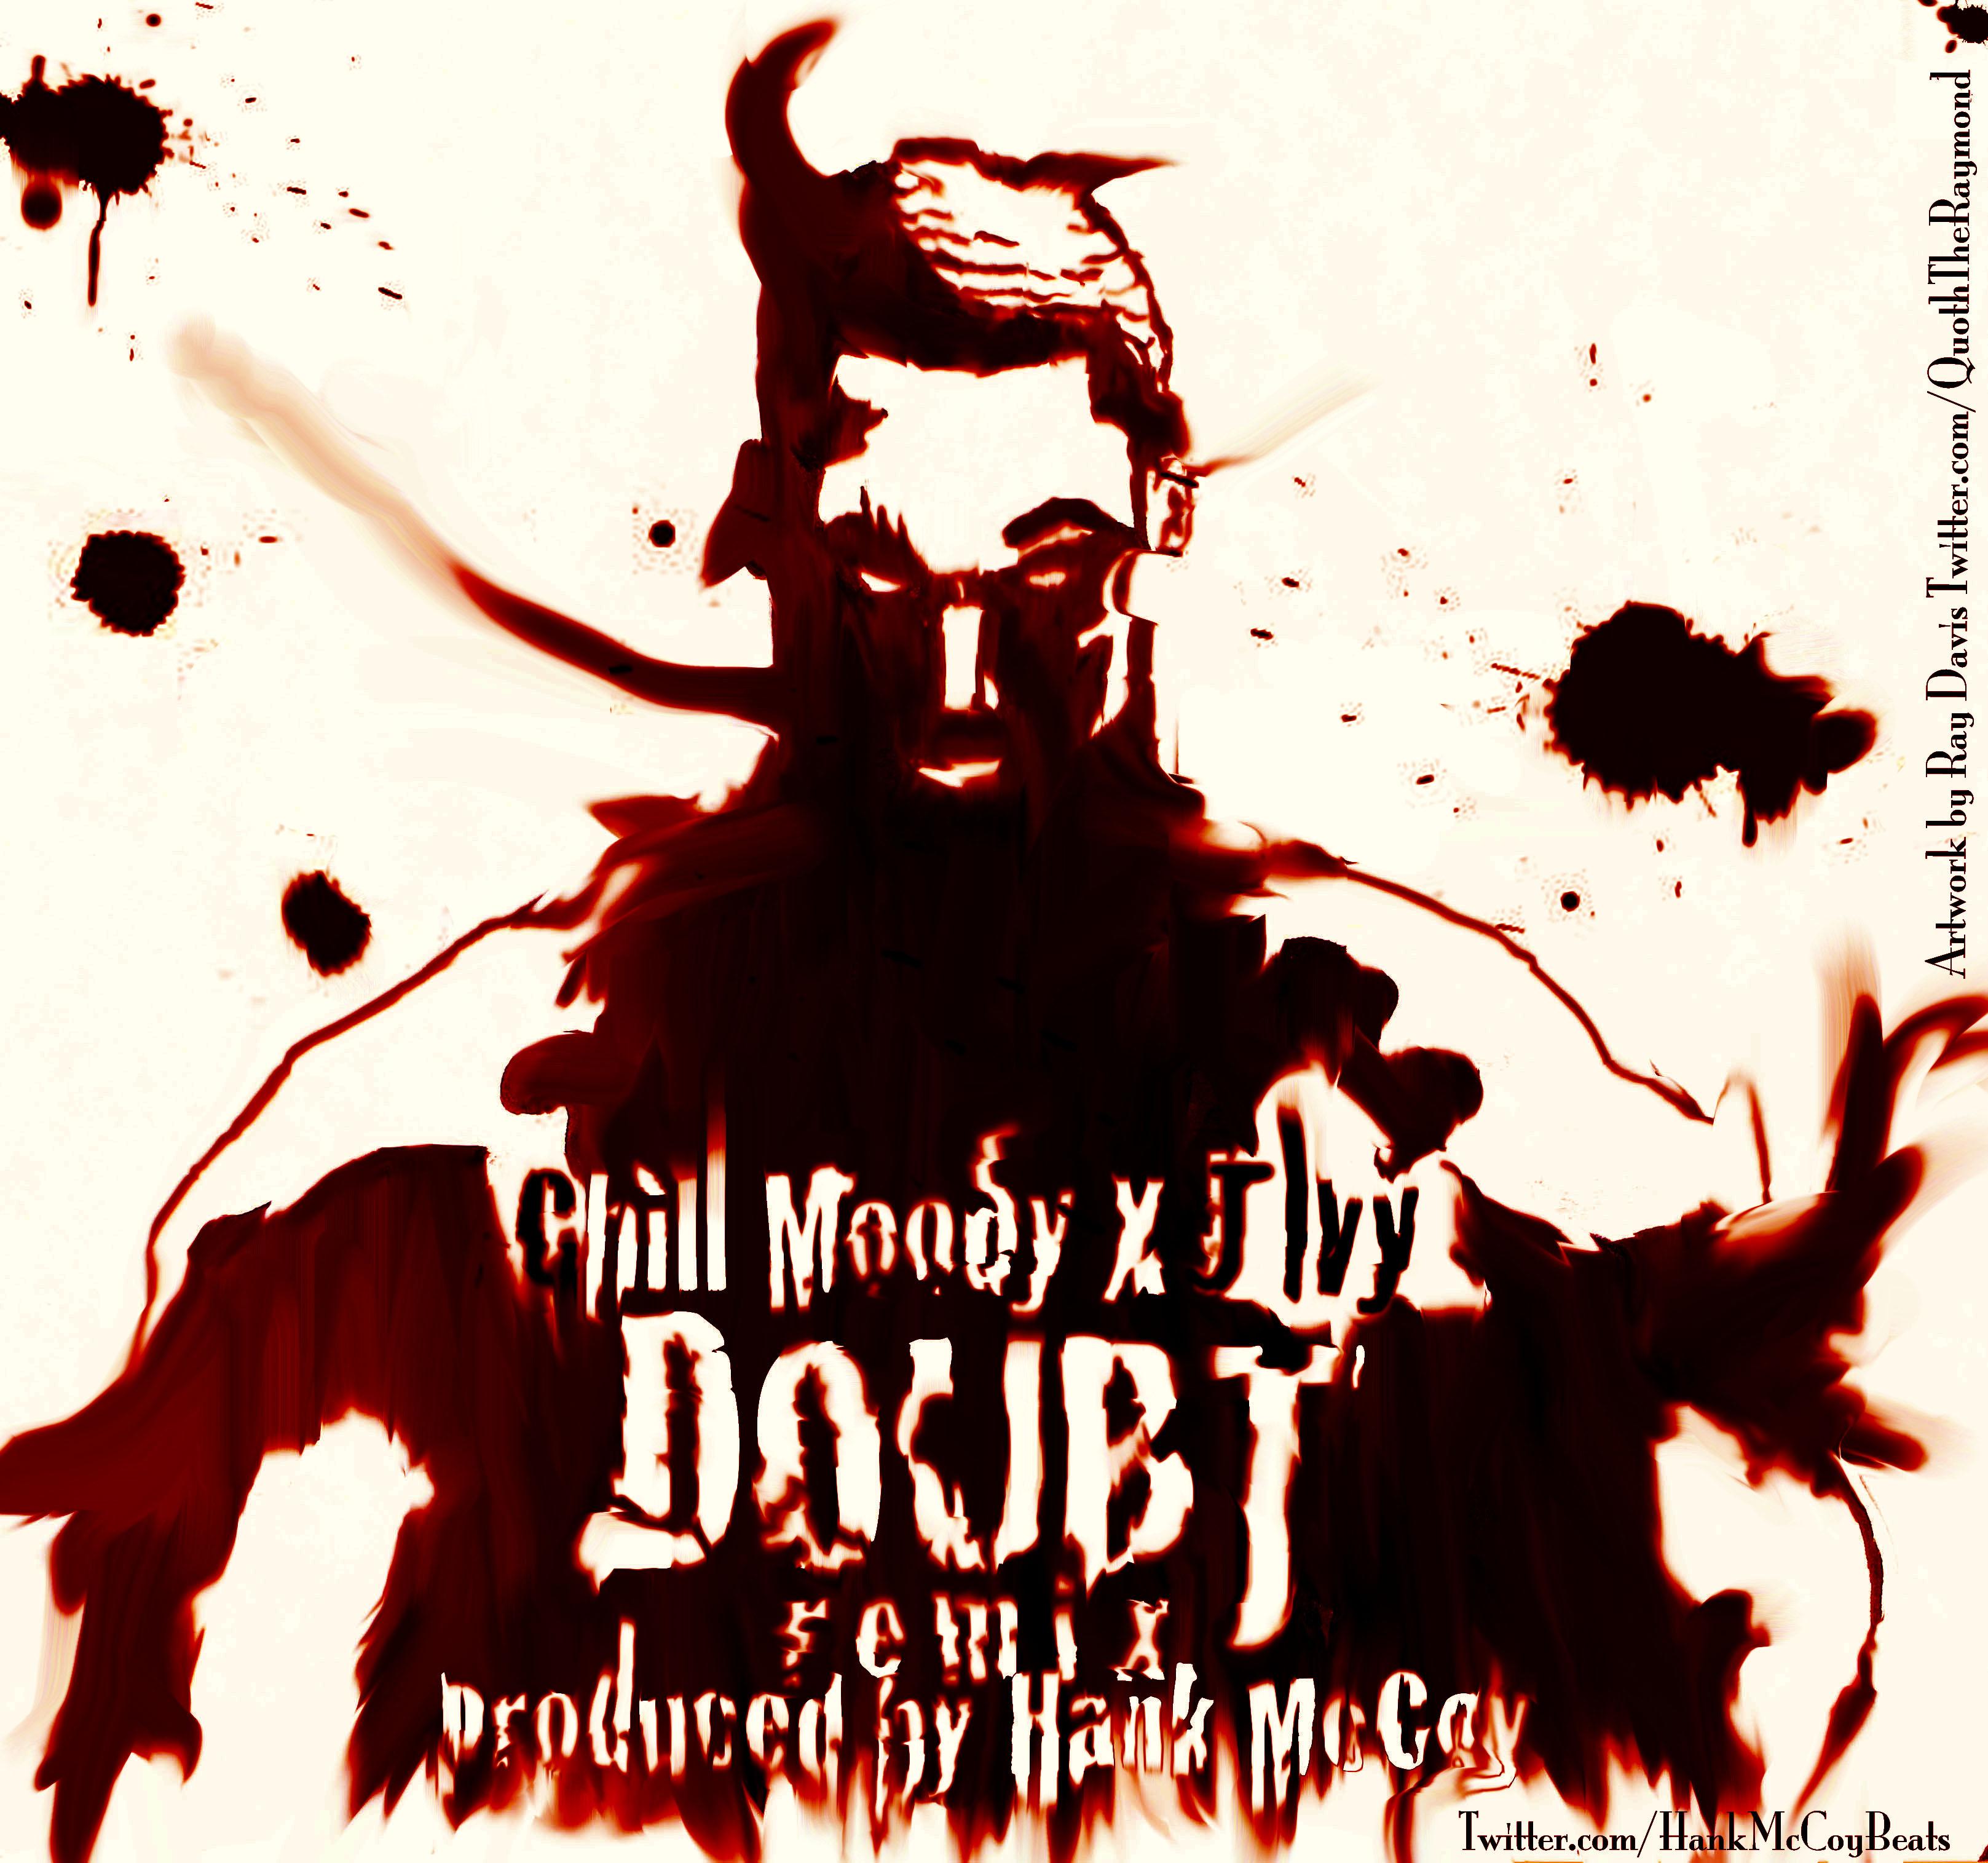 chill-moody-x-j-ivy-doubt-hank-mccoy-remix-HHS1987-2012 Chill Moody (@ChillMoody) - Doubt Ft. @J_Ivy (@HankMcCoyBeats Remix)